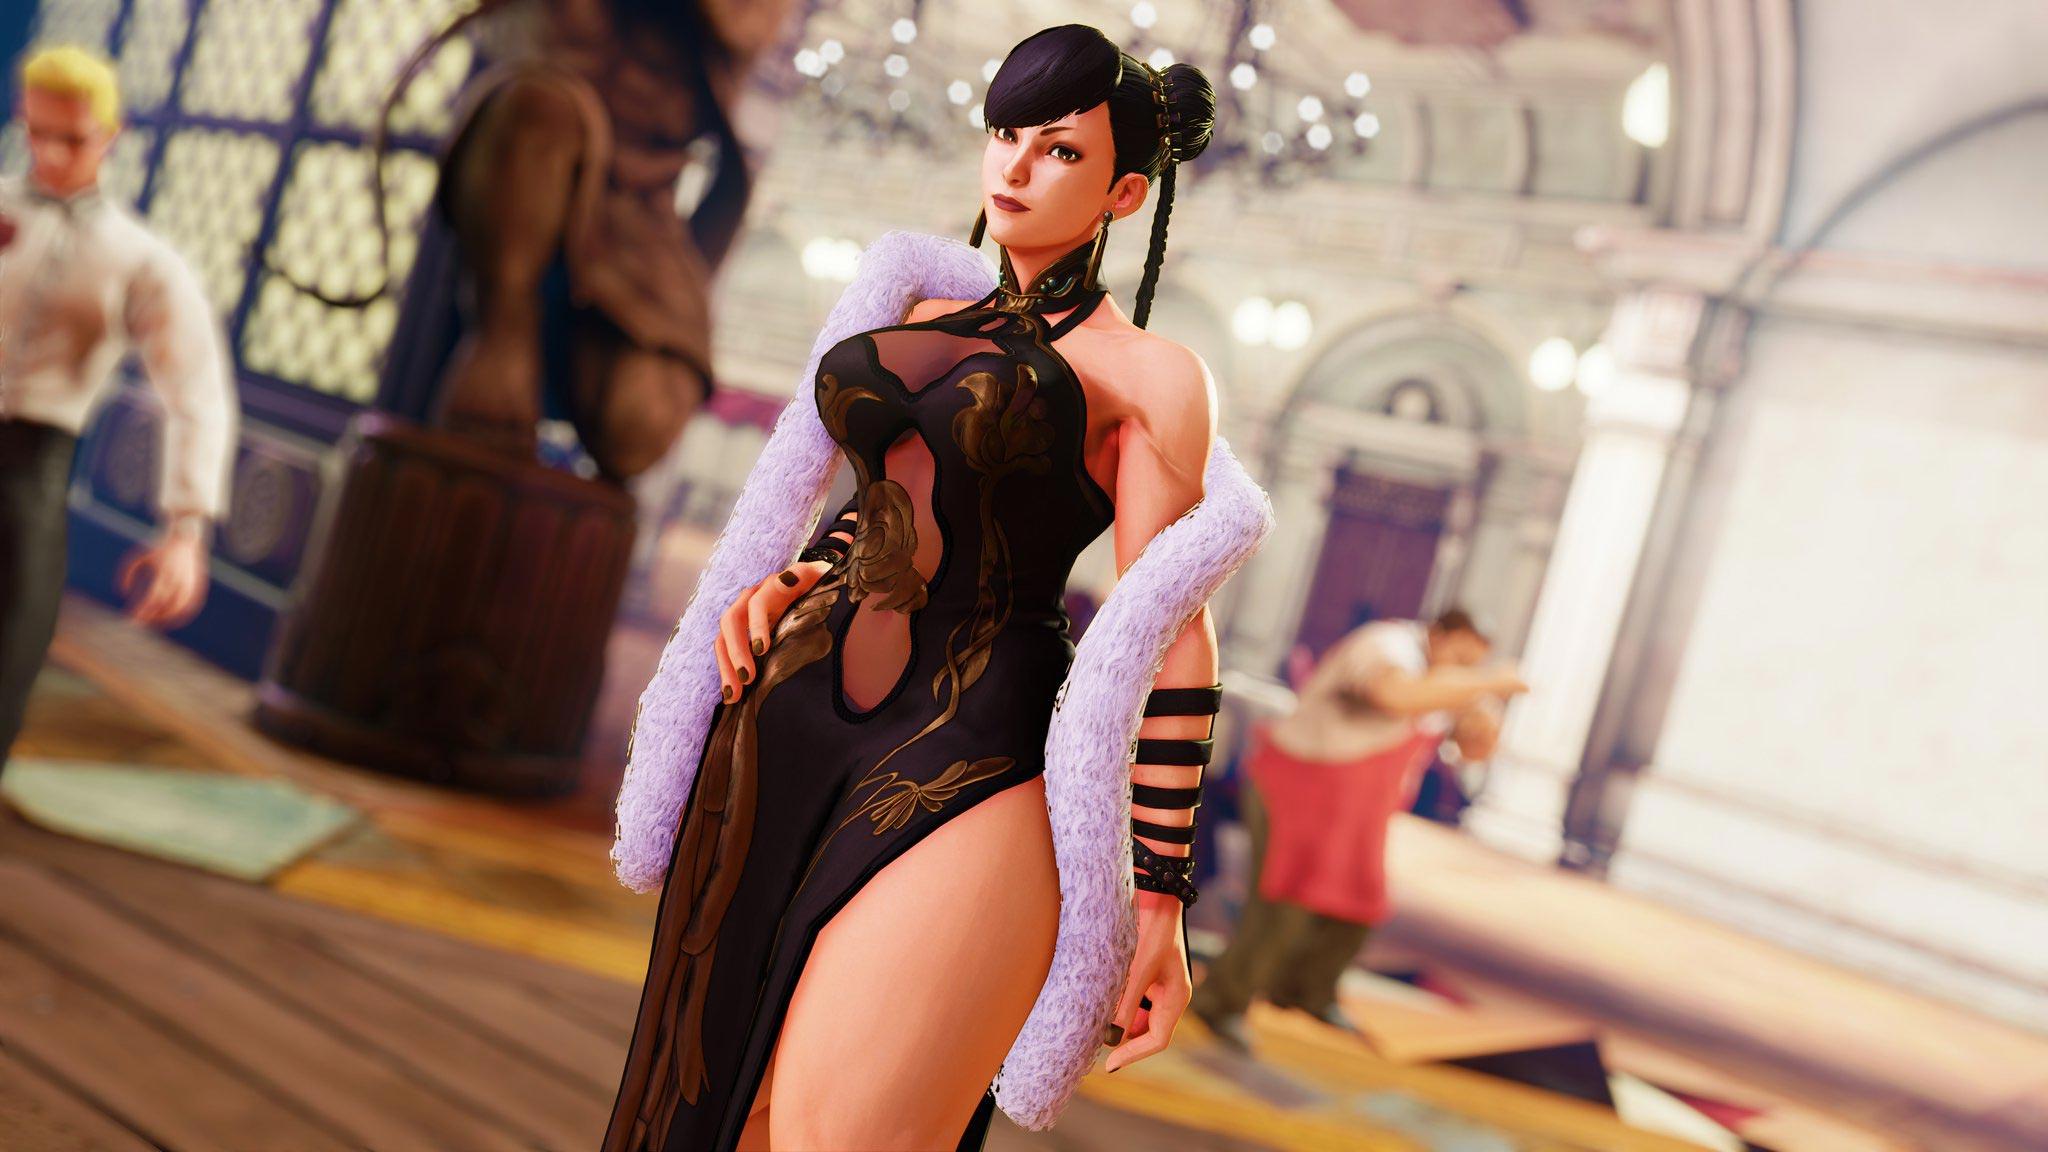 Eden's Street Fighter stills 11 out of 12 image gallery